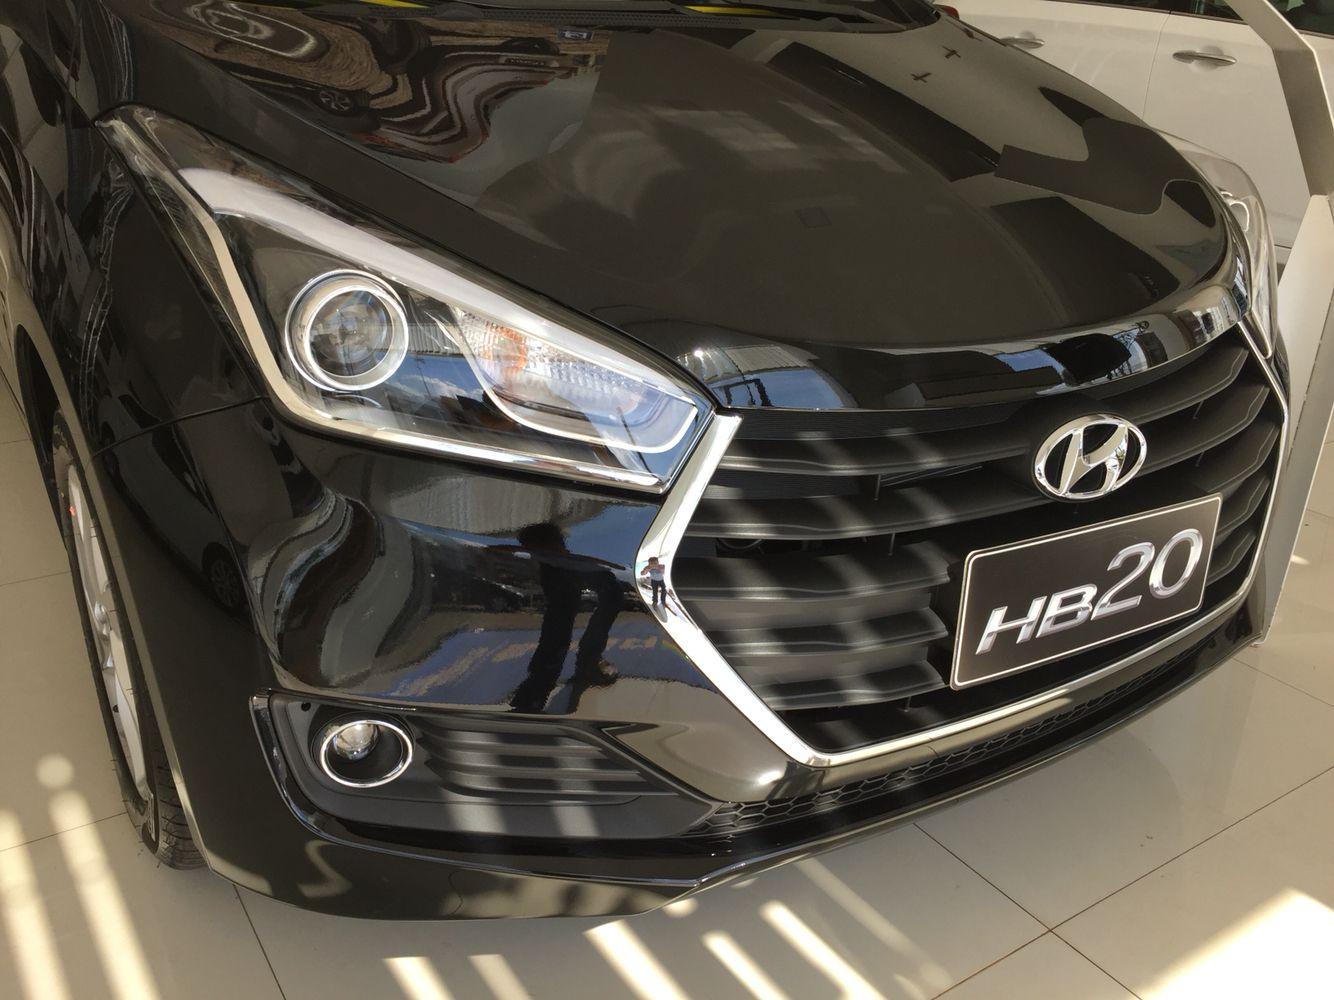 HB20 2016